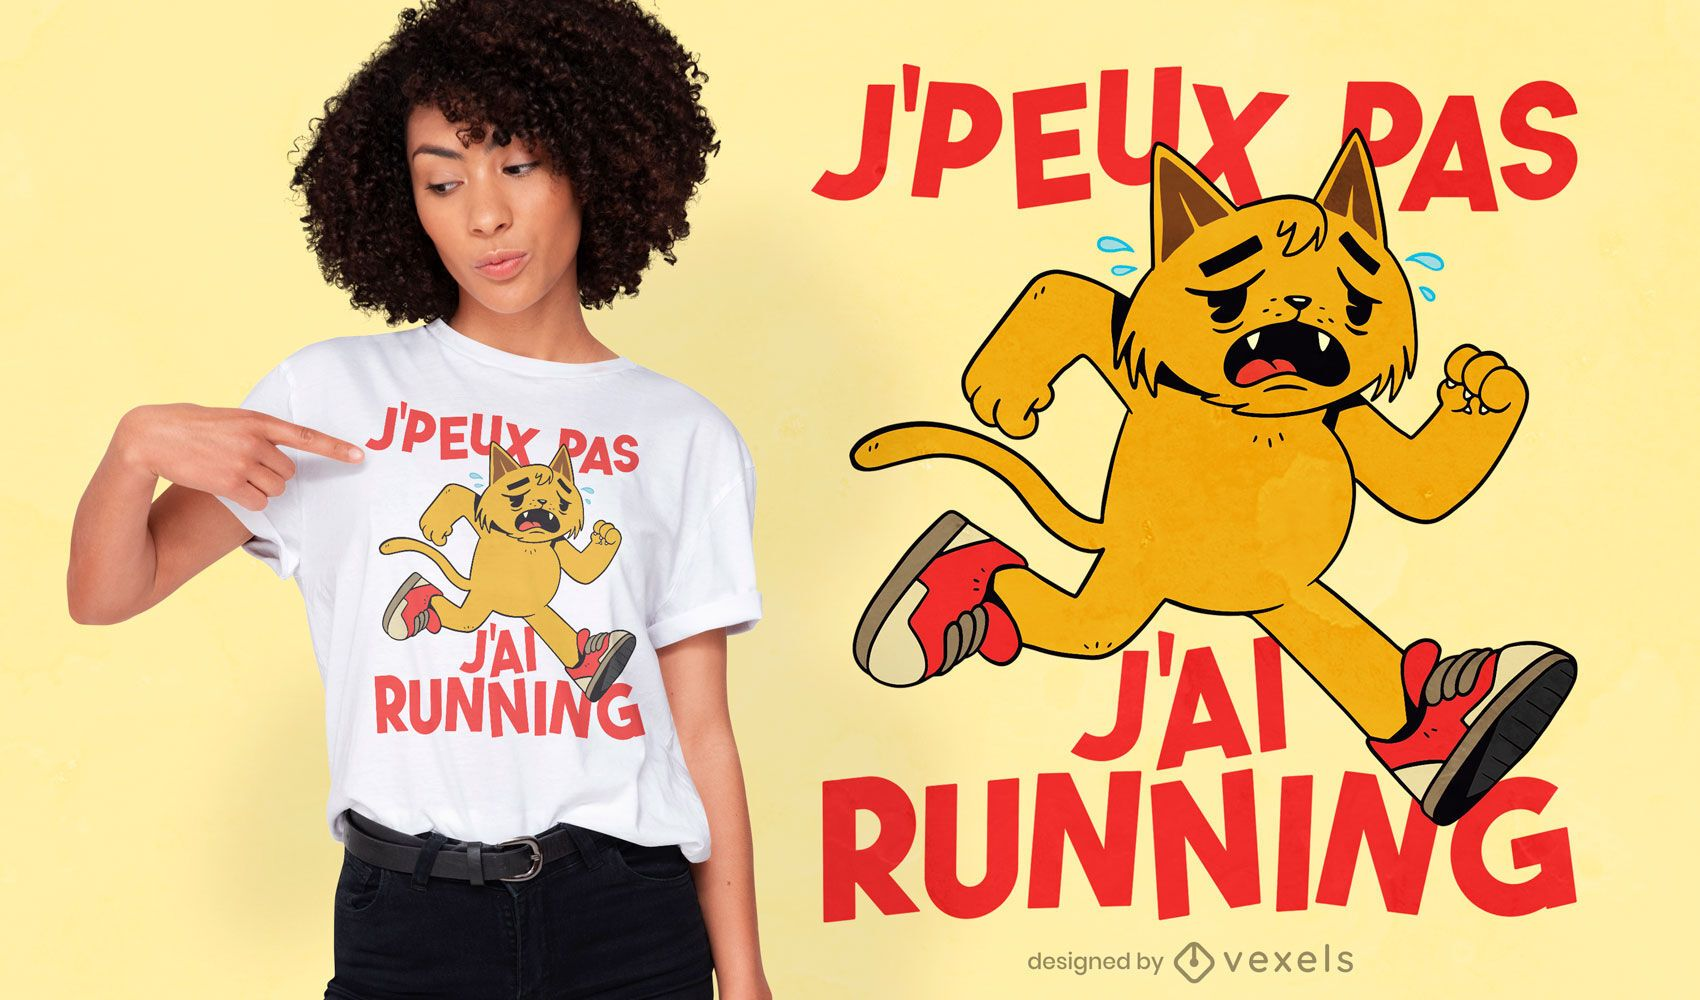 Gato cansado correndo design de camiseta